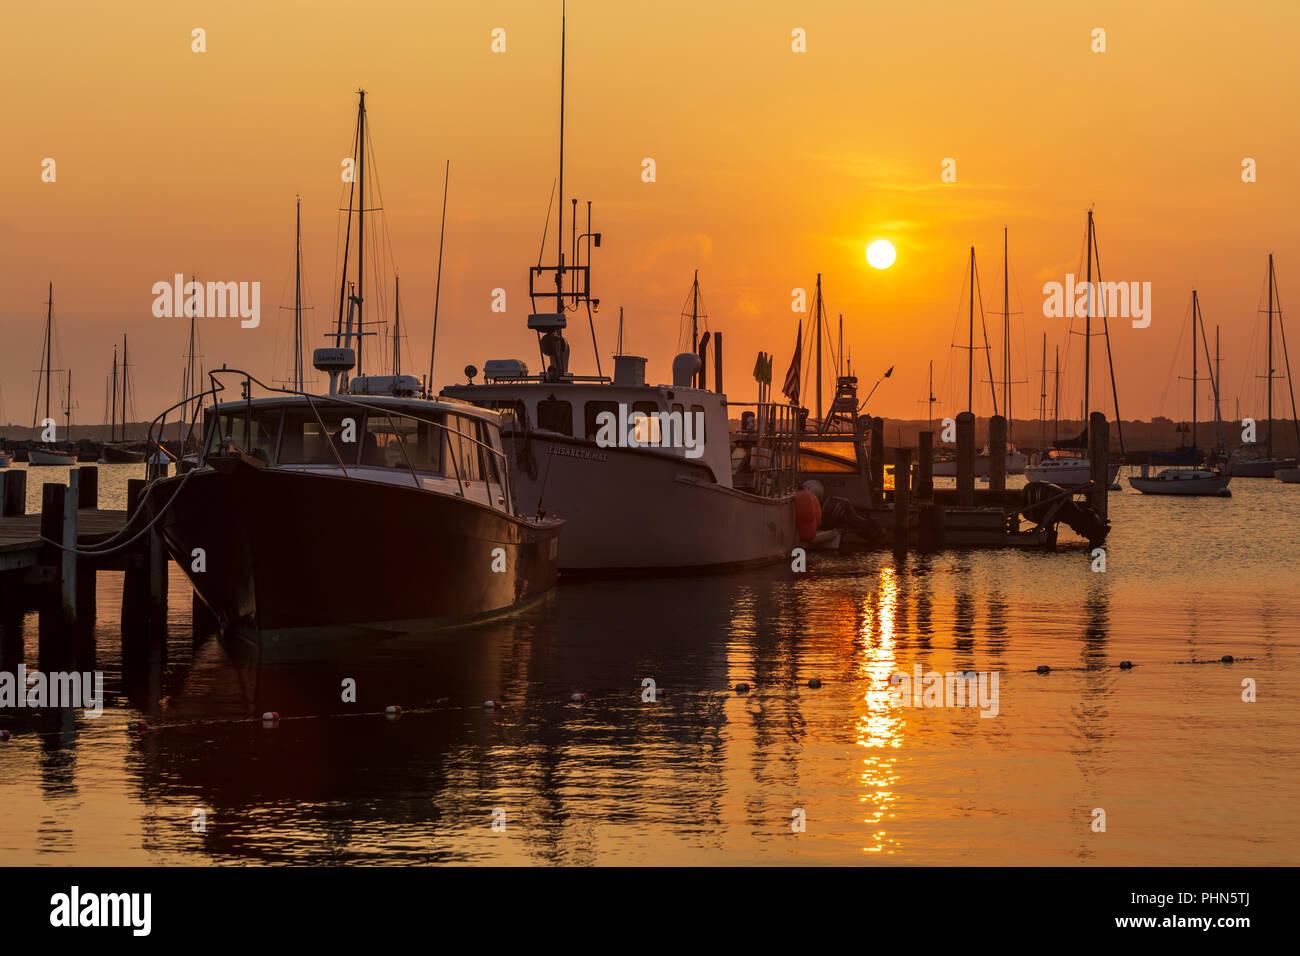 The sun rises over fishing boats and pleasure craft in Vineyard Haven Harbor in Tisbury, Massachusetts on Martha's Vineyard. Stock Photo